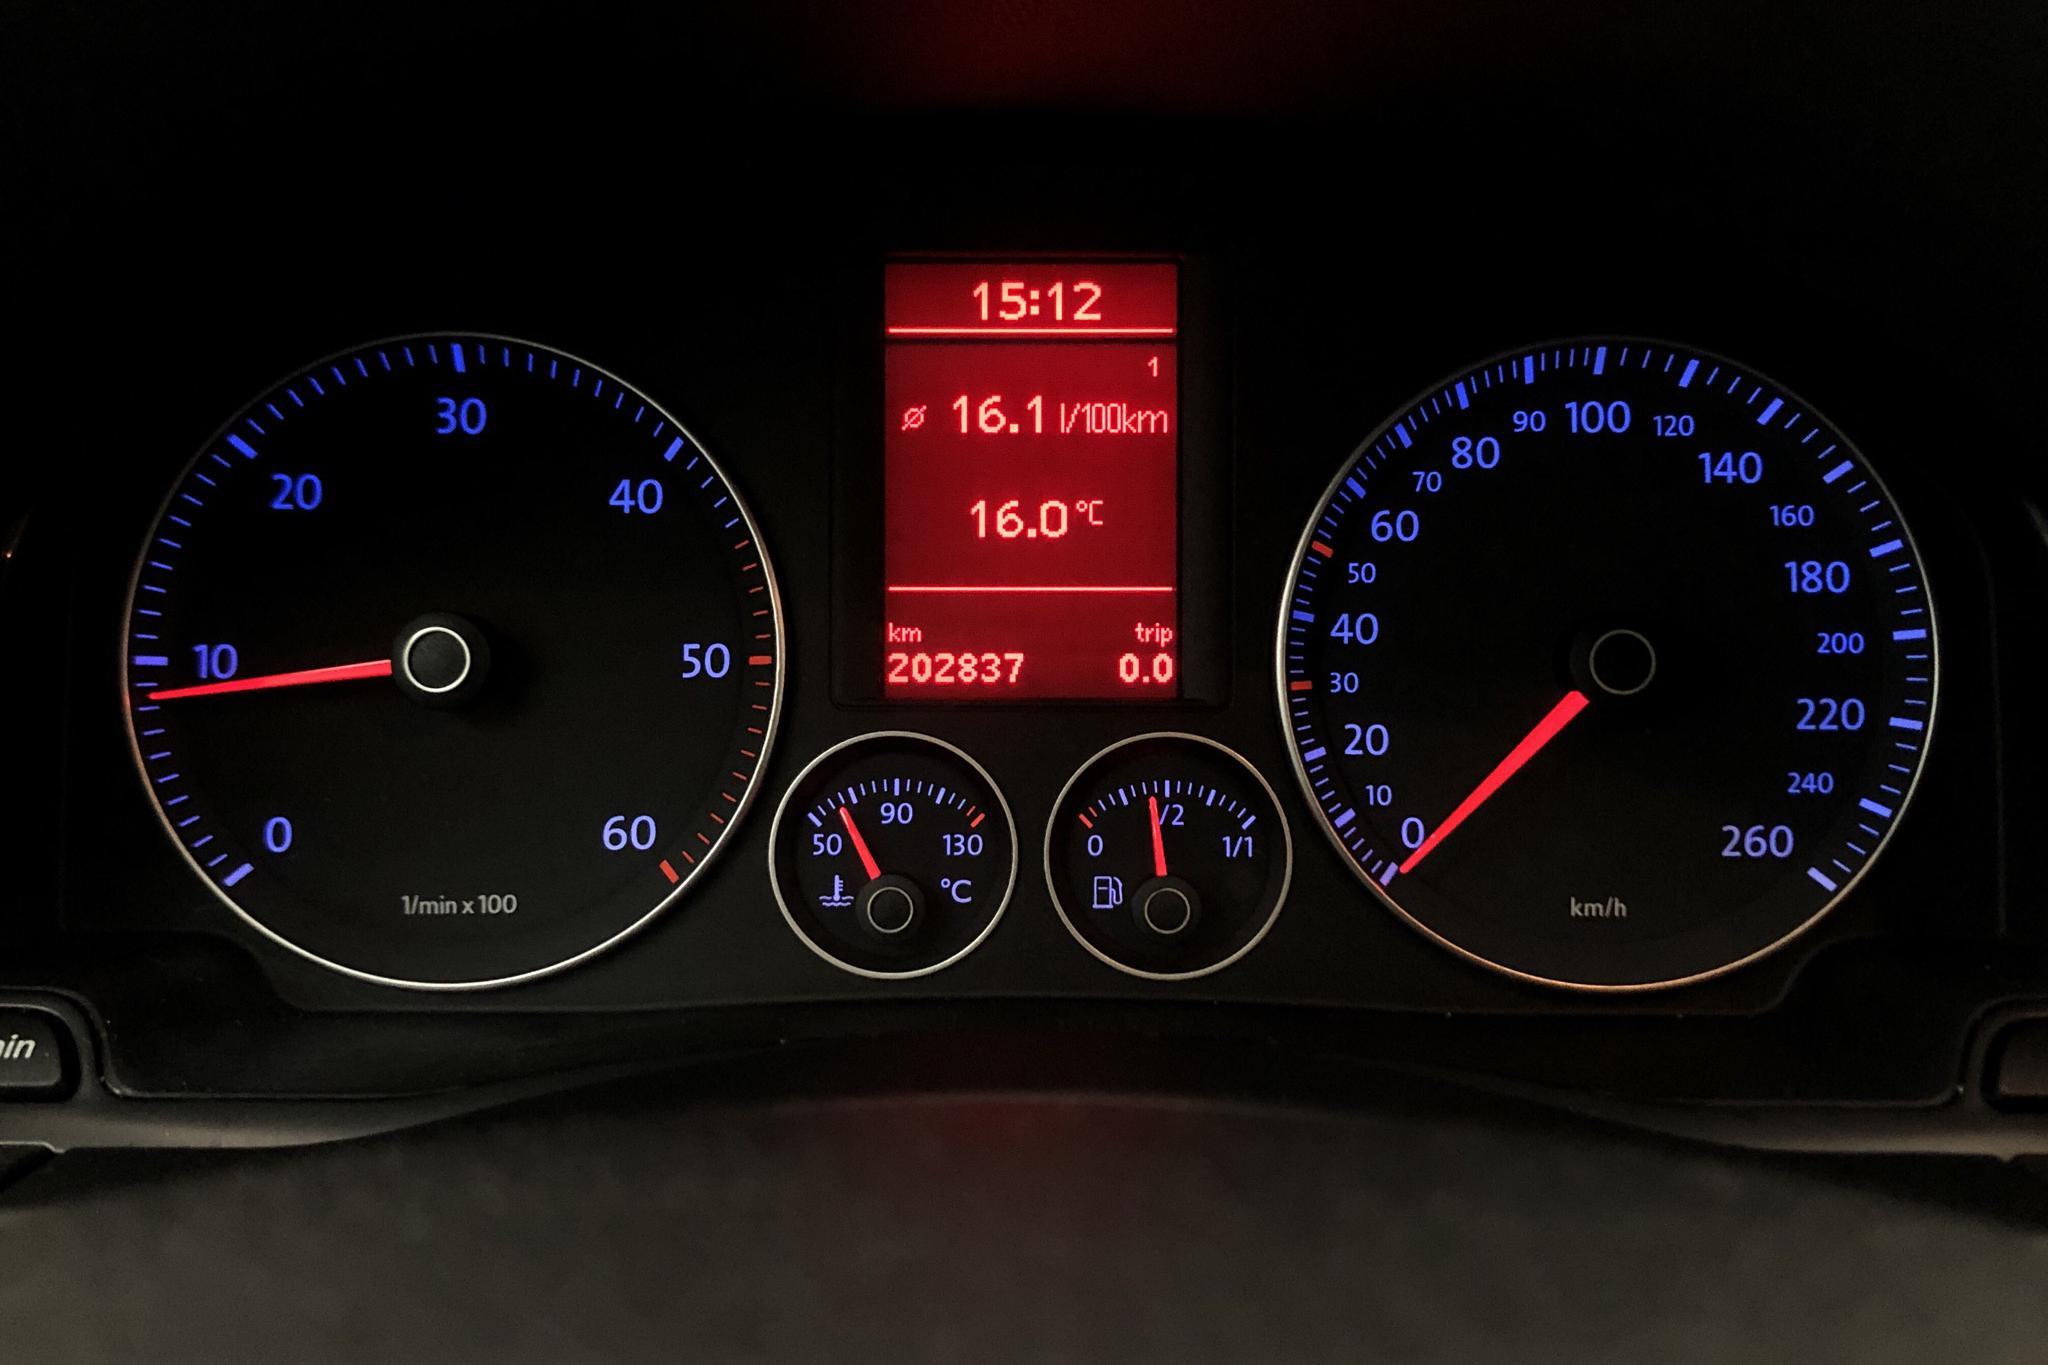 VW Golf A5 2.0 TDI 5dr 4Motion (140hk) - 202 830 km - Manual - 2007